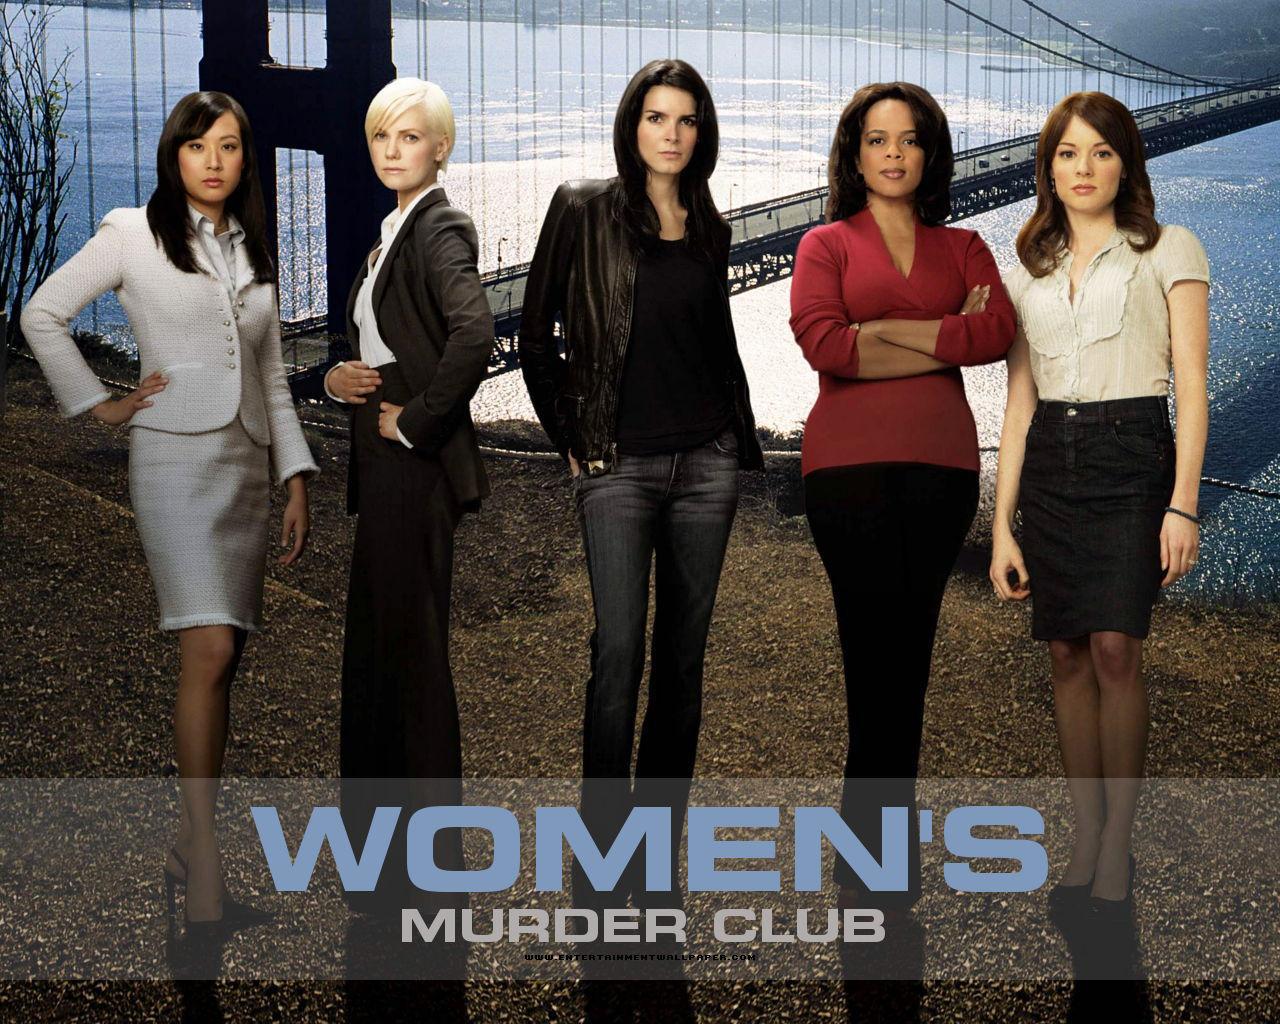 Women's Murder Club Mystery Novels James Patterson #3,4,5,6,7,8,9,10,11,12,14